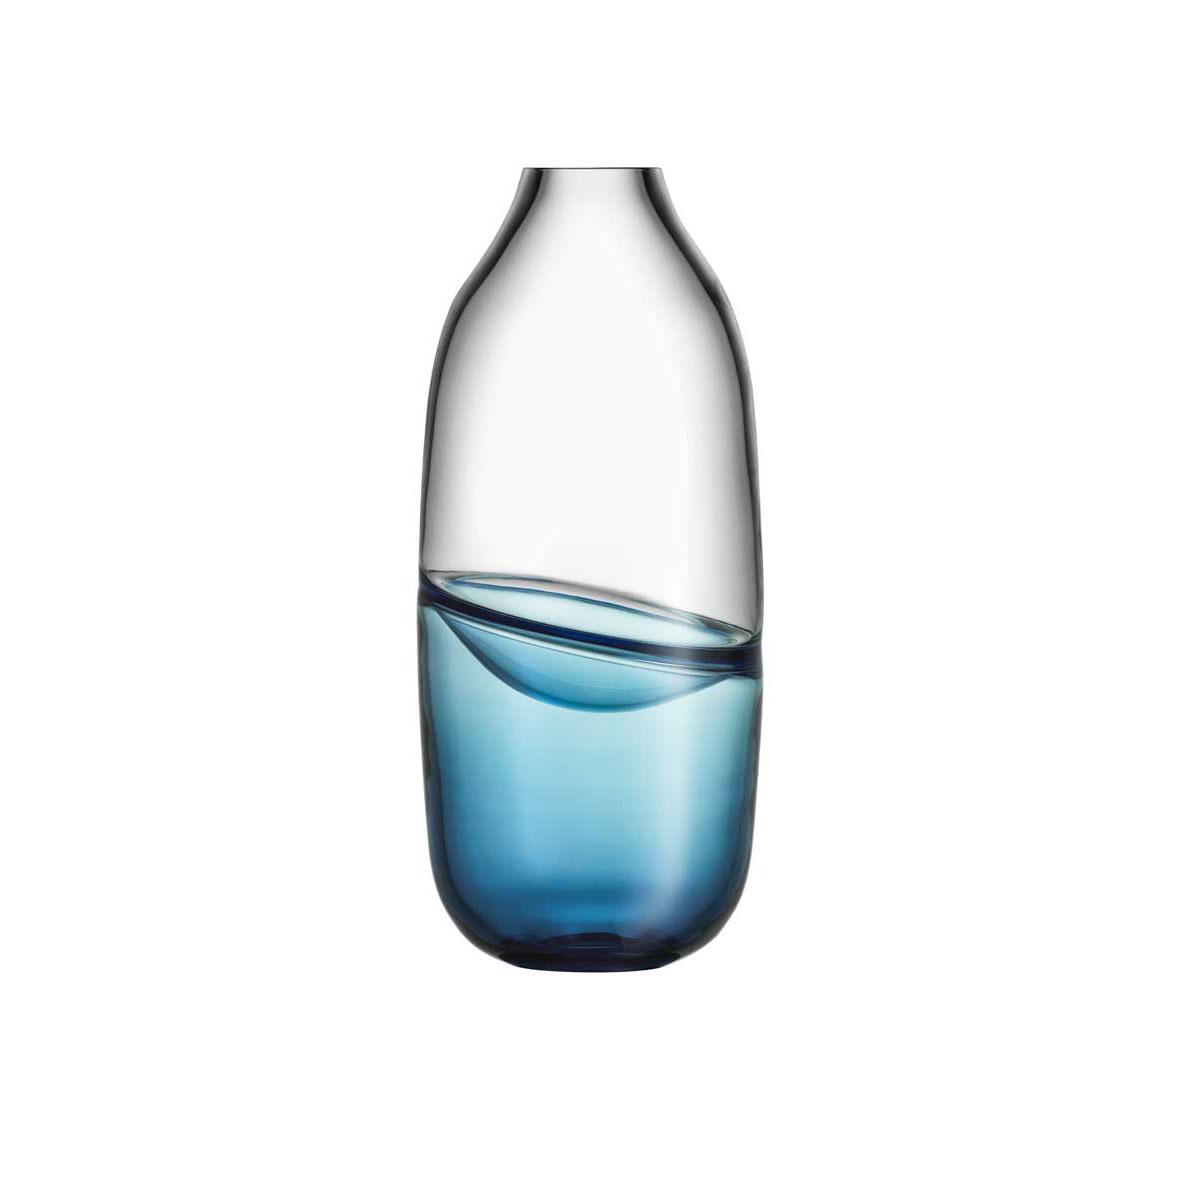 Kosta Boda Art Glass, Mattias Stenberg Septum Vase, Steel Blue, Limited Edition of 300